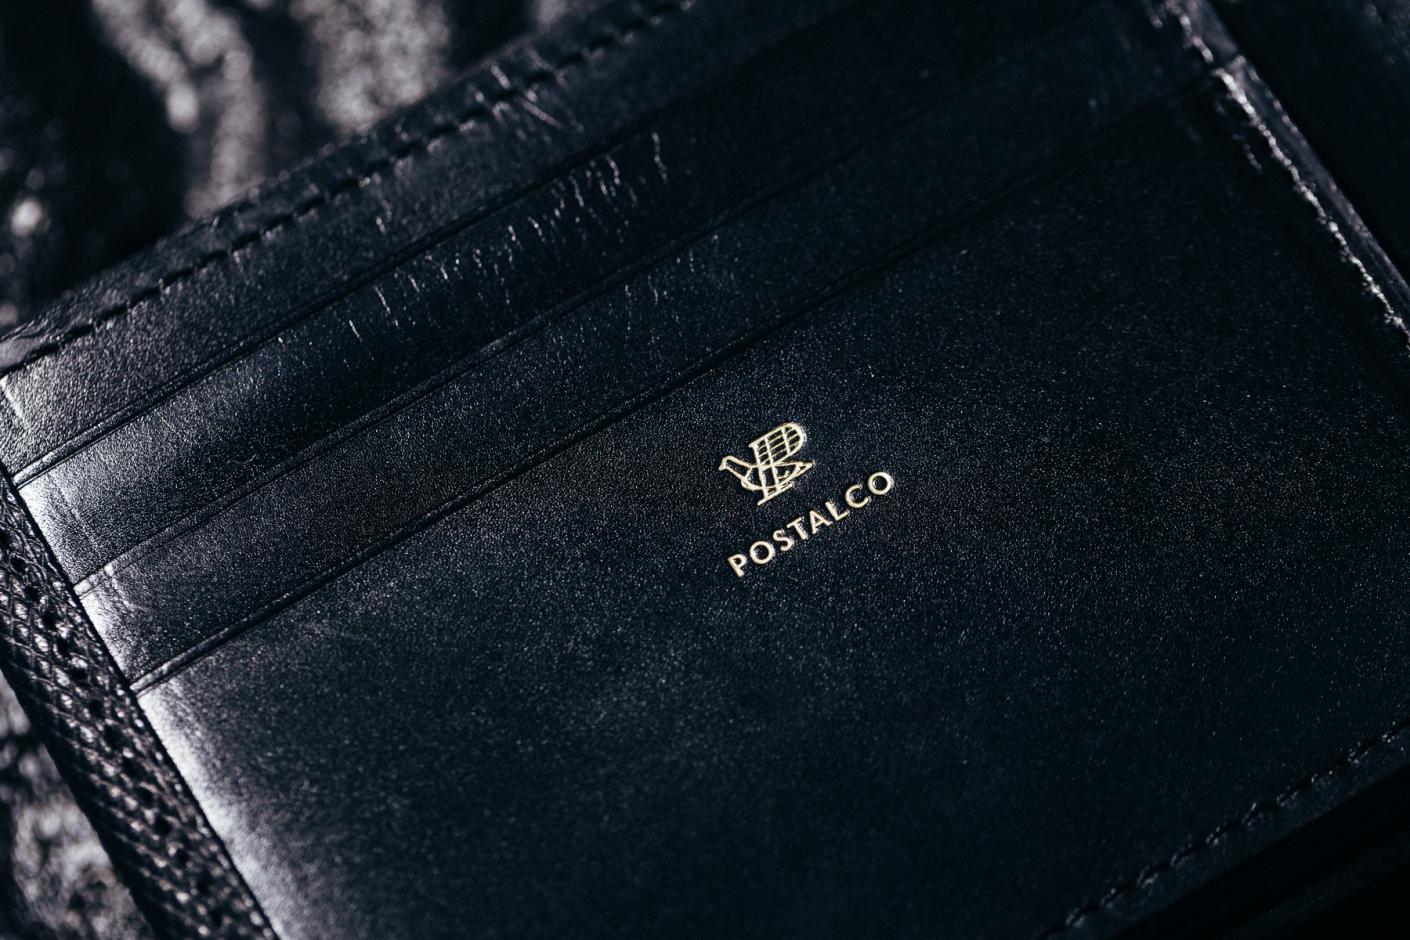 postalco 2014 spring summer leather goods 5 Postalco Spring/Summer 2014 Leather Accessories Collection